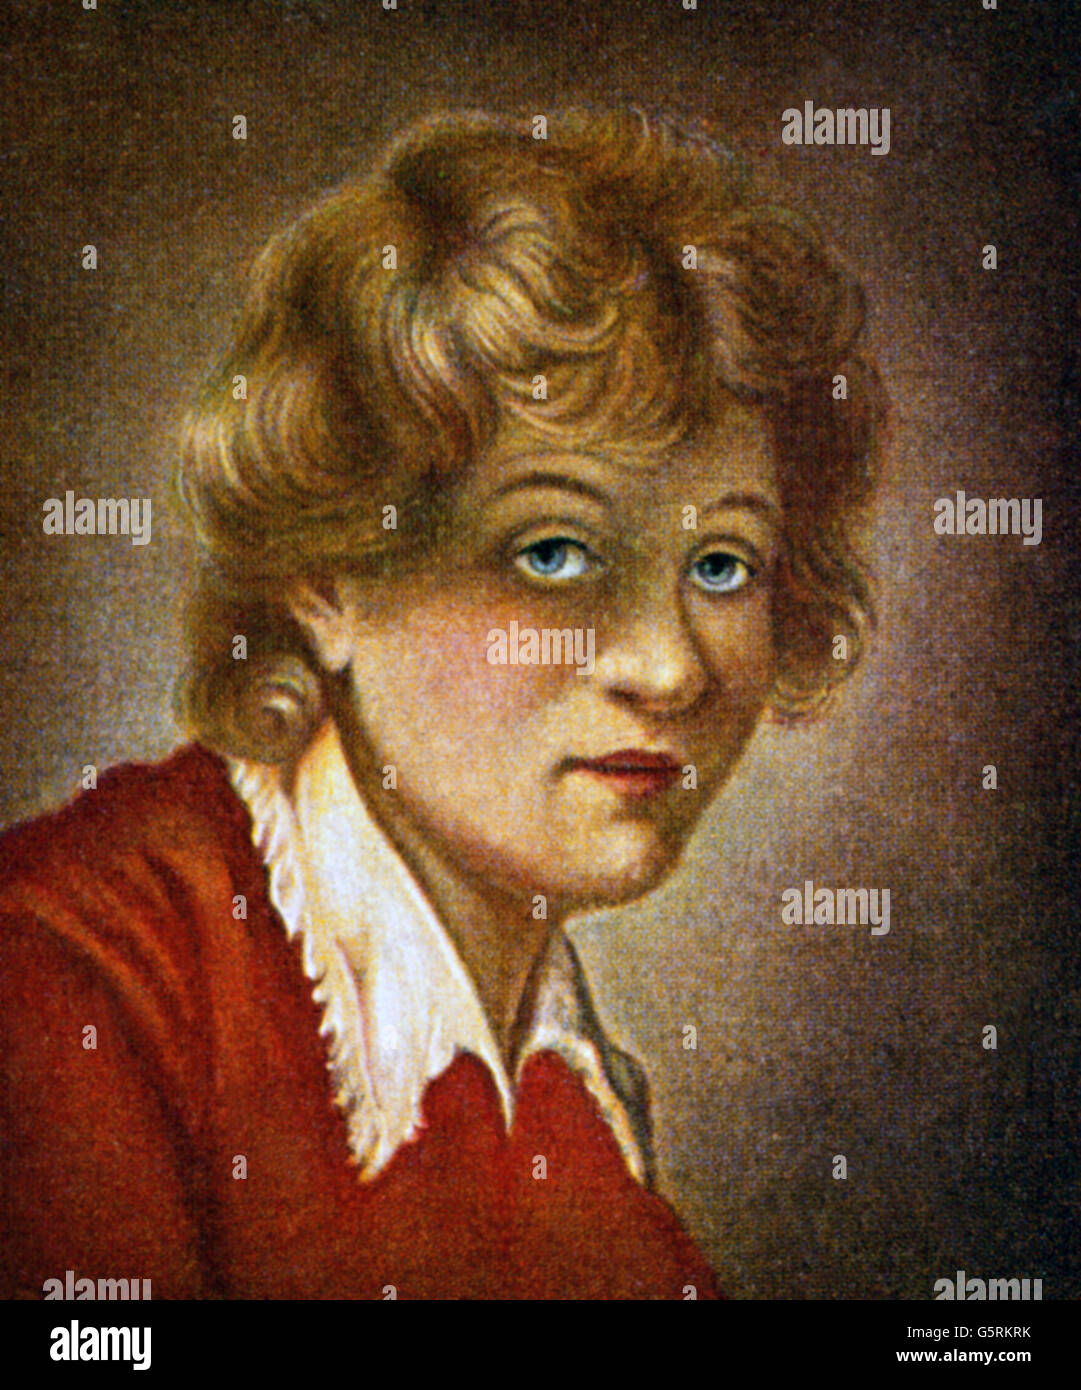 Rembrandt, Harmensz van Rijn, 15.7.1606 - 4.10.1669, Dutch painter, portrait, miniature, after Wilhelmine von Thil, - Stock Image